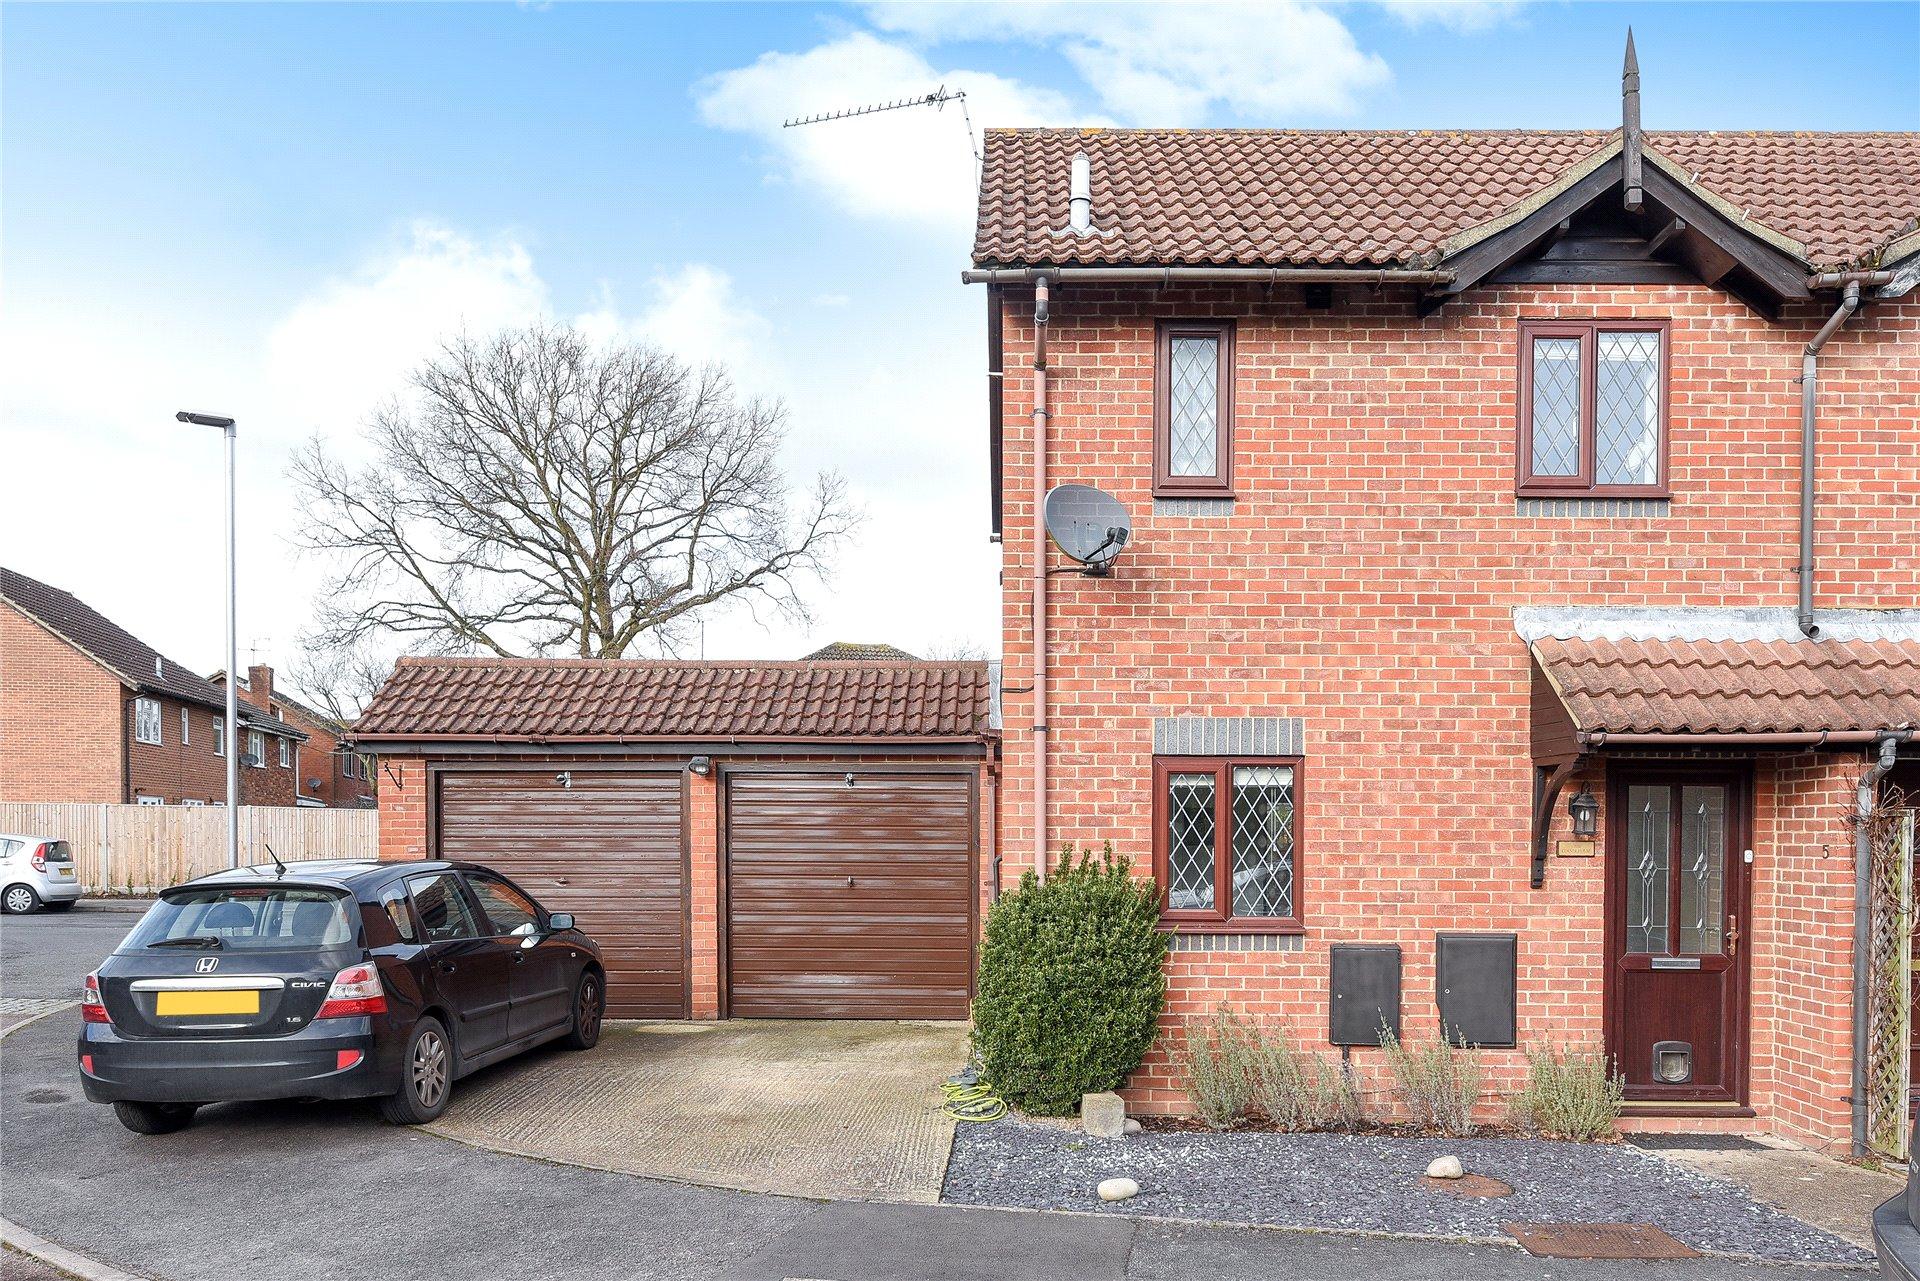 2 Bedrooms Semi Detached House for sale in St James Road, Finchampstead, Wokingham, Berkshire, RG40